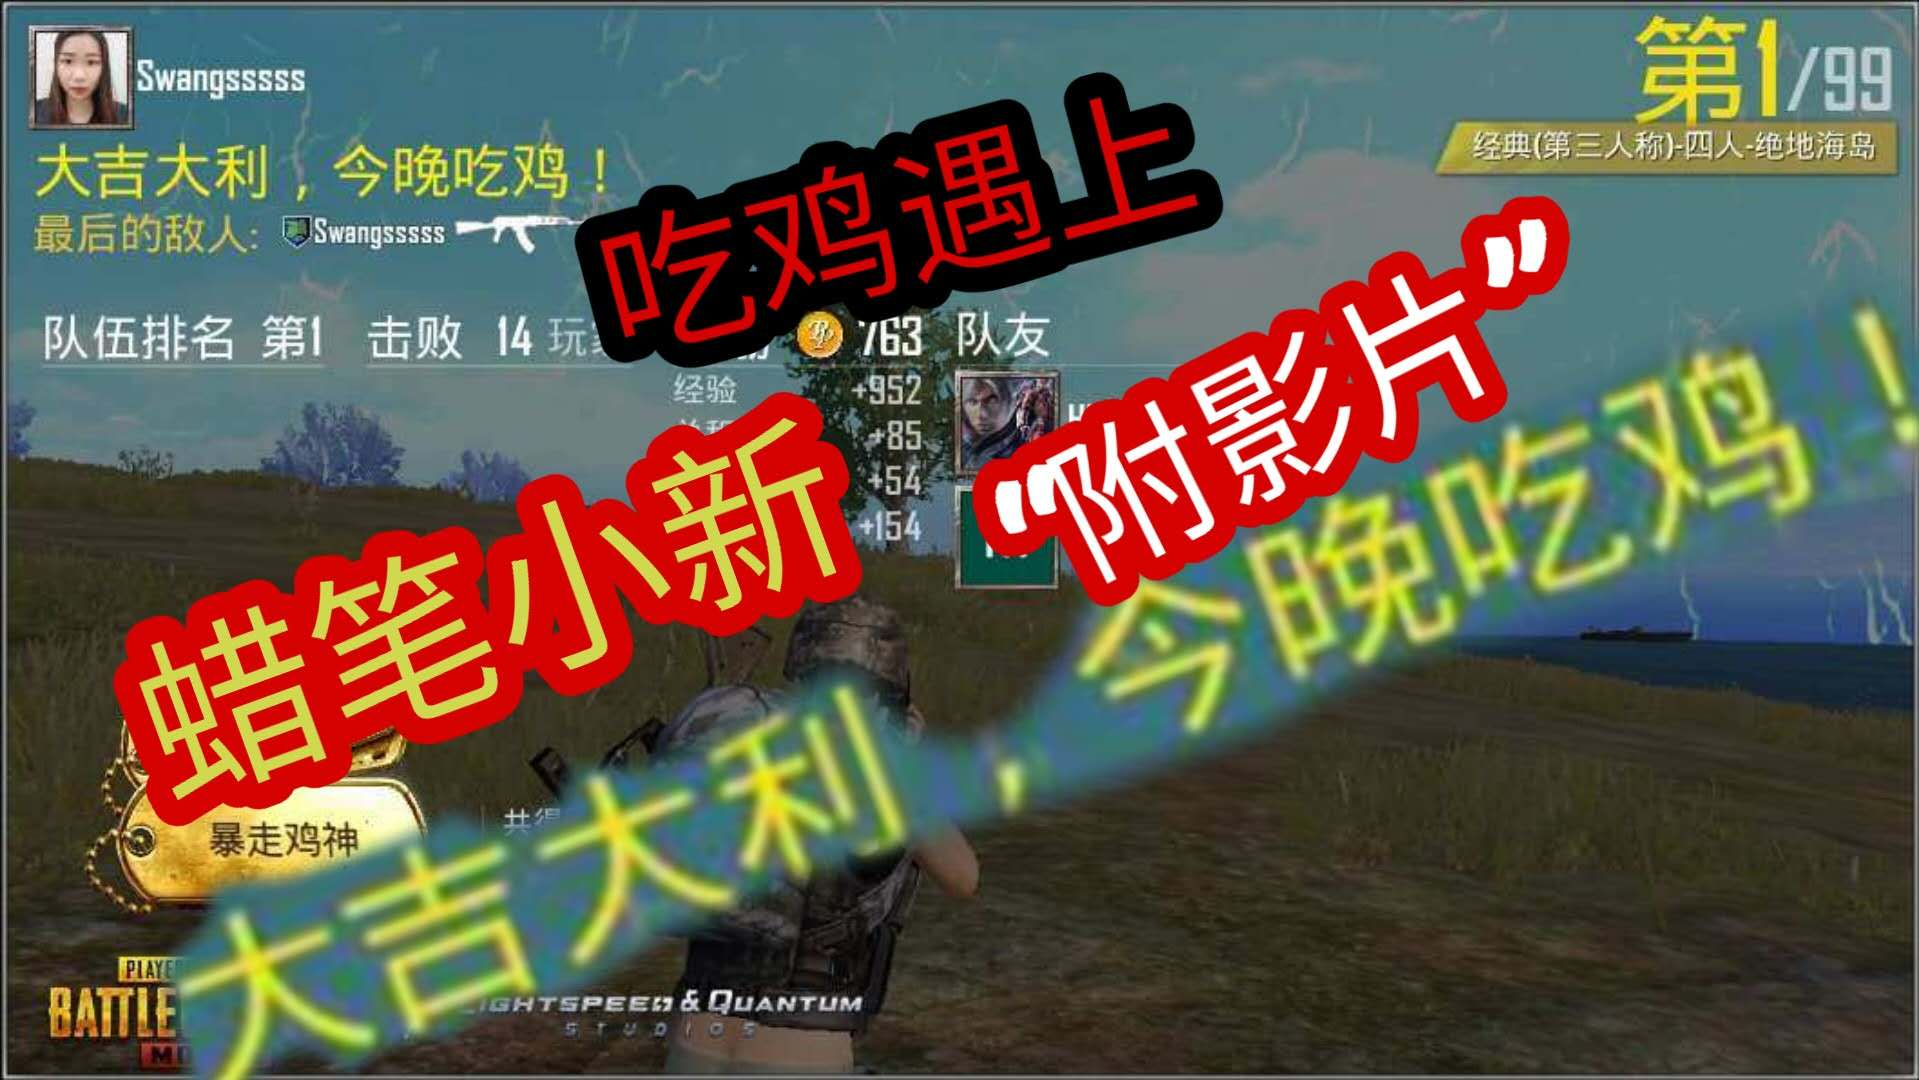 WeChat Image 20190606043402 at omgloh.com